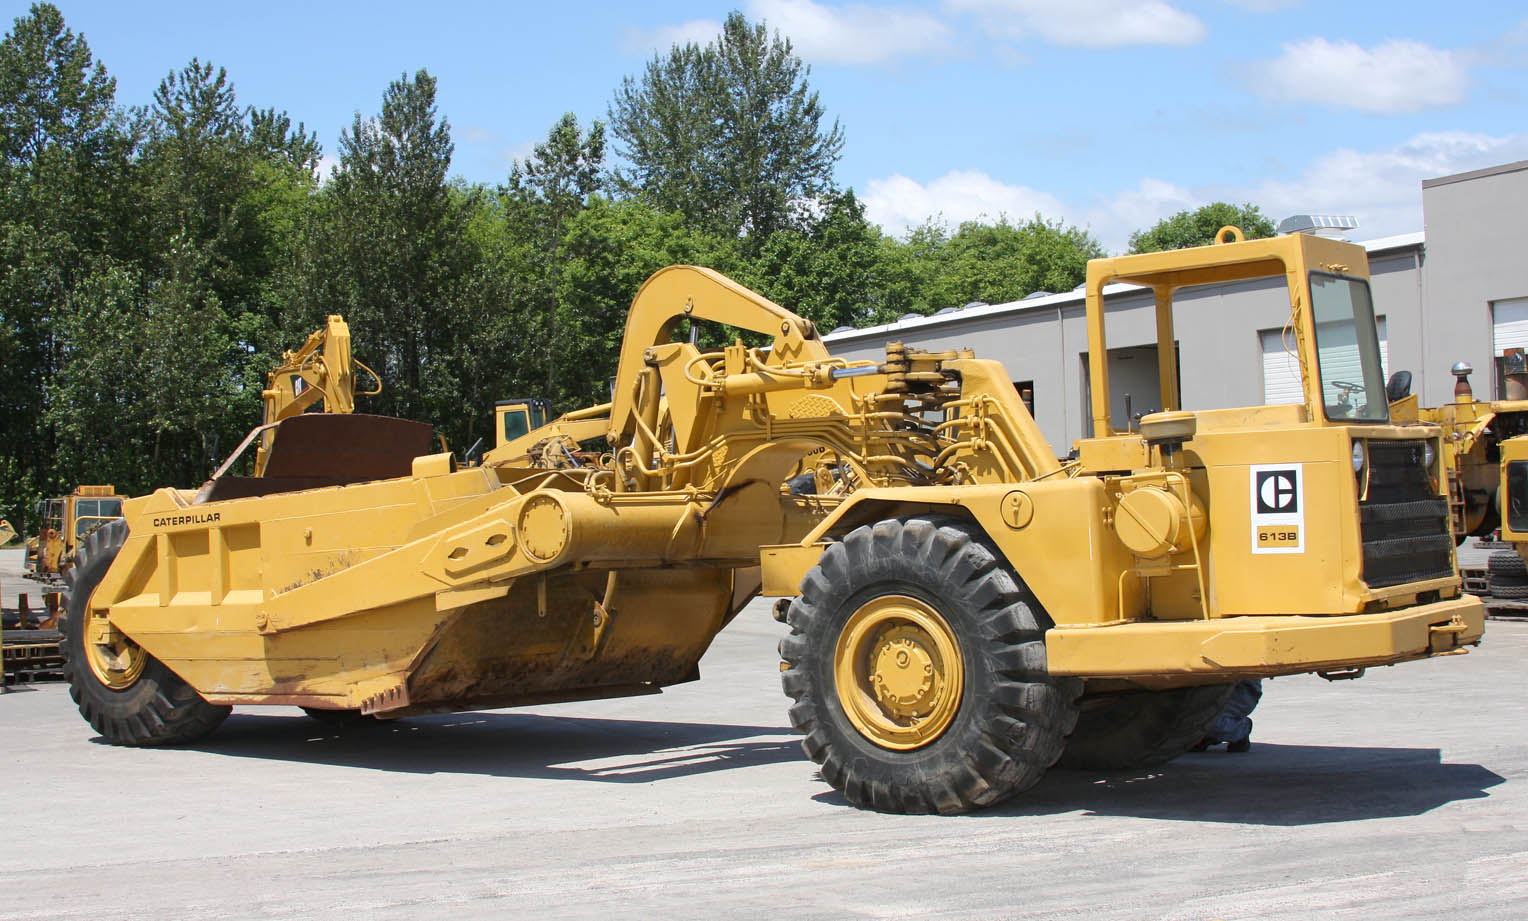 613B Motor Scraper